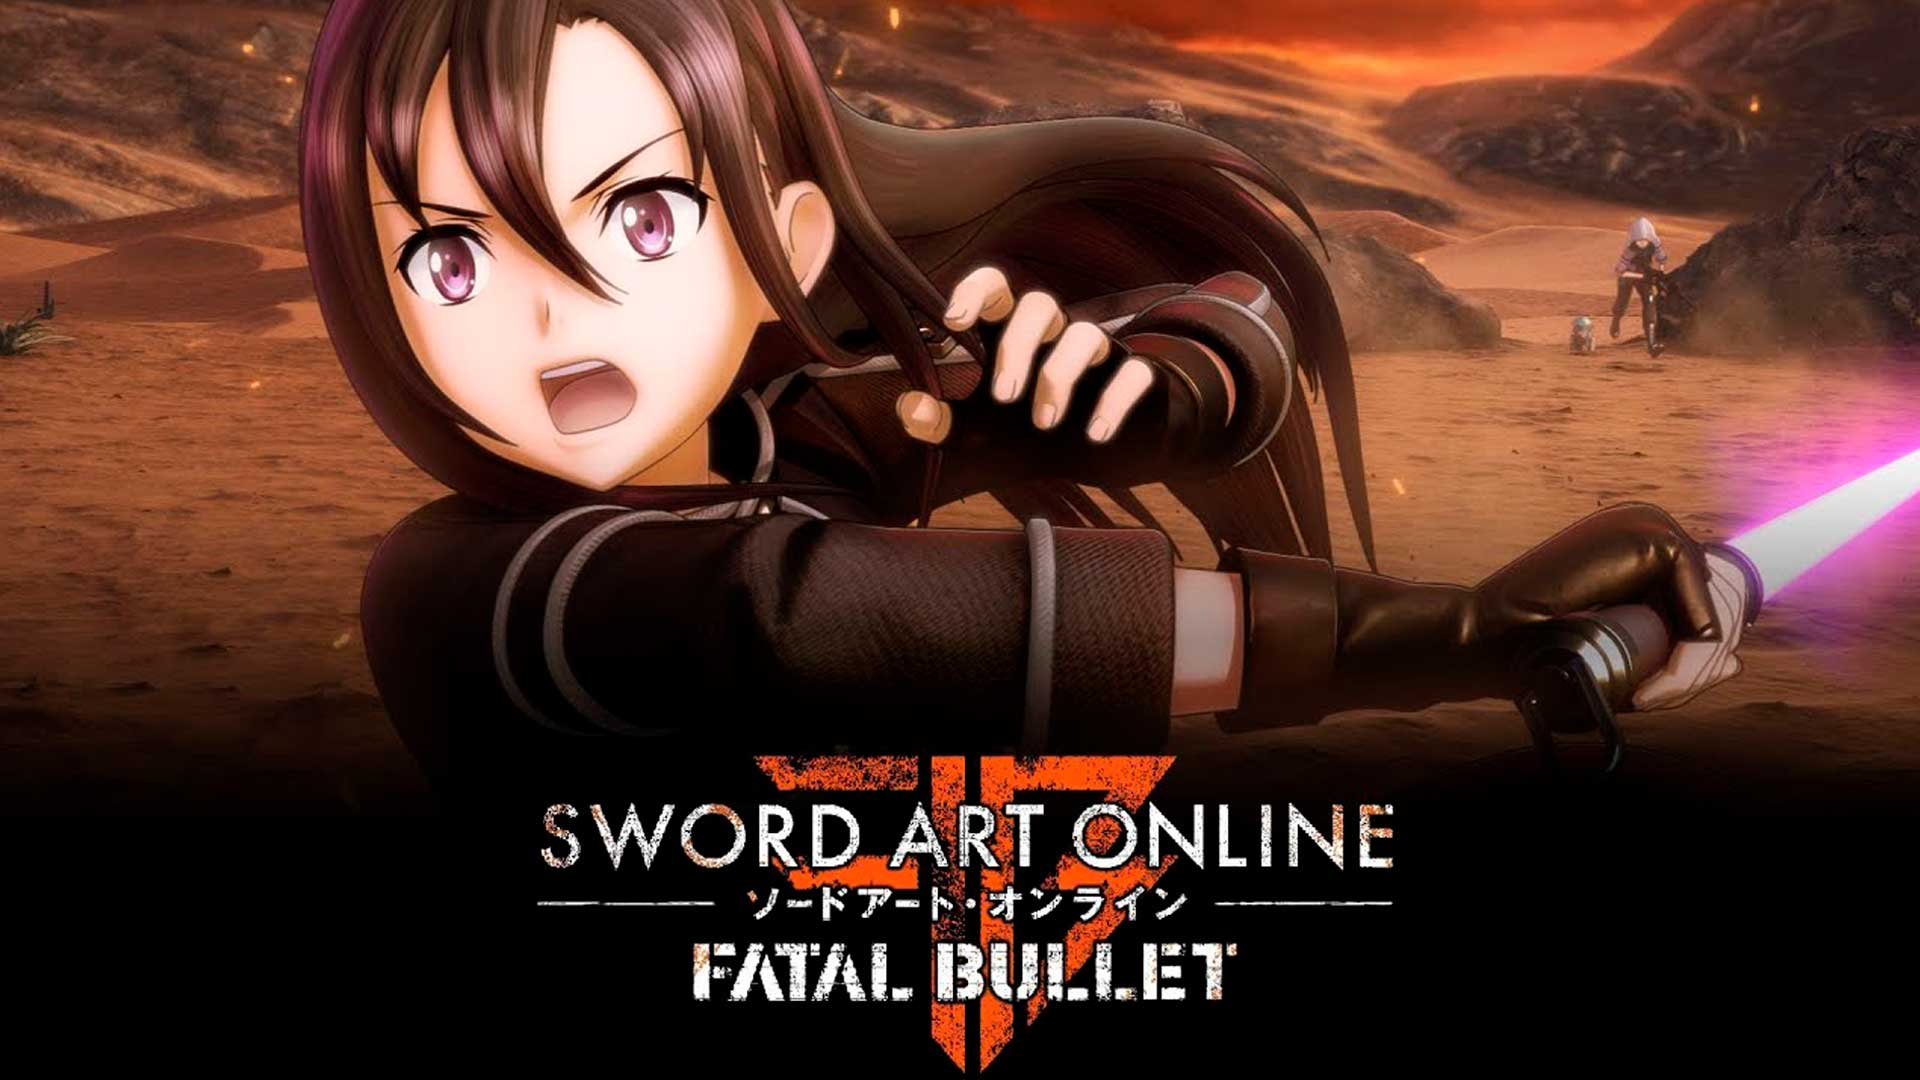 sword art online fatal bullet review